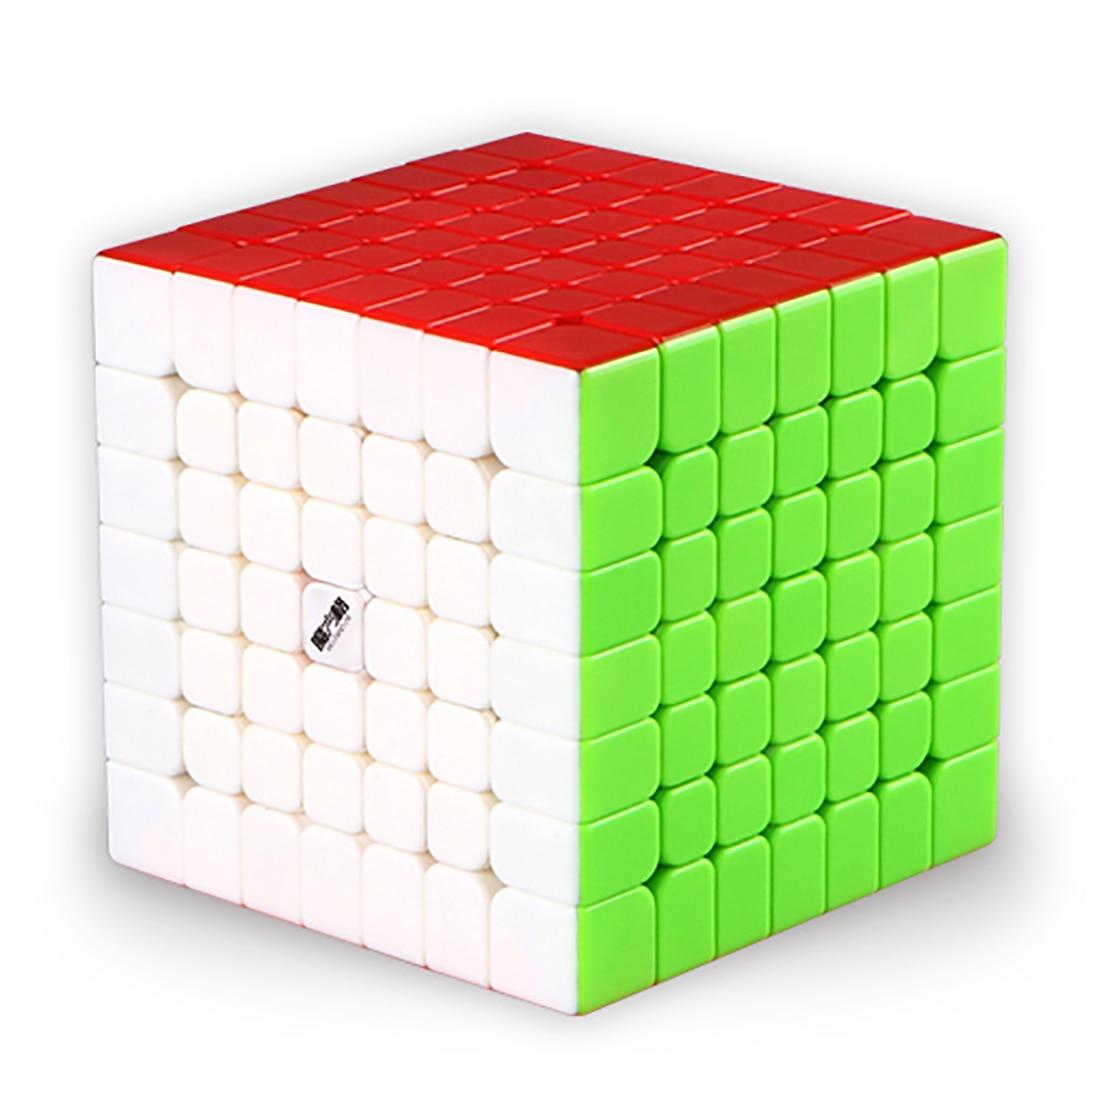 Qiyi Mofangge Wuji 7x7 Magic Cube Vitesse Puzzle-69mm